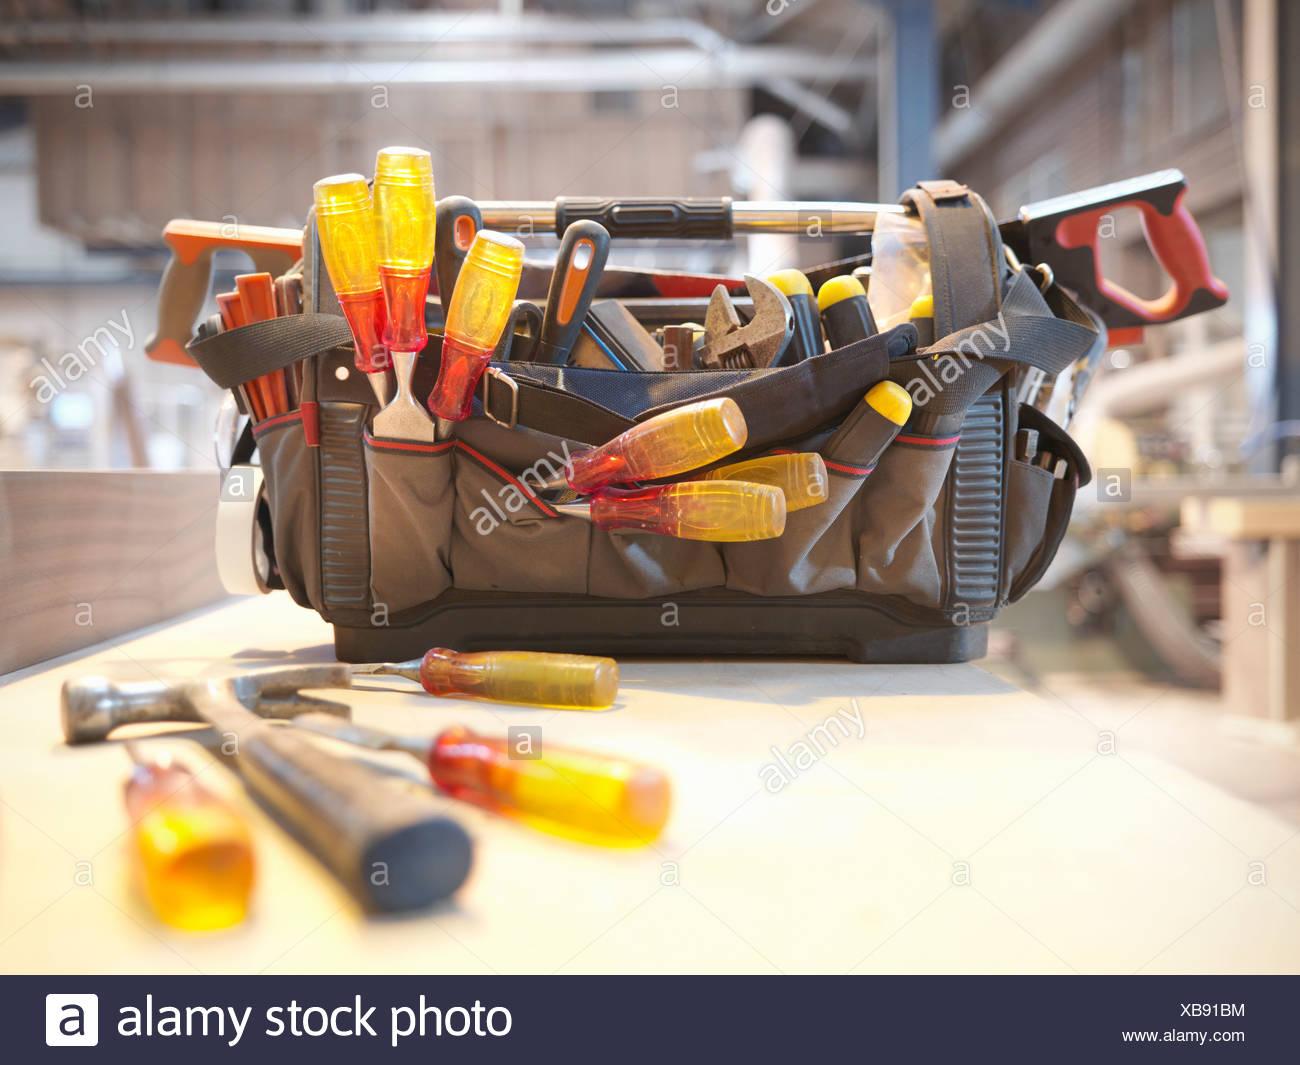 Tool kit in woodwork workshop - Stock Image